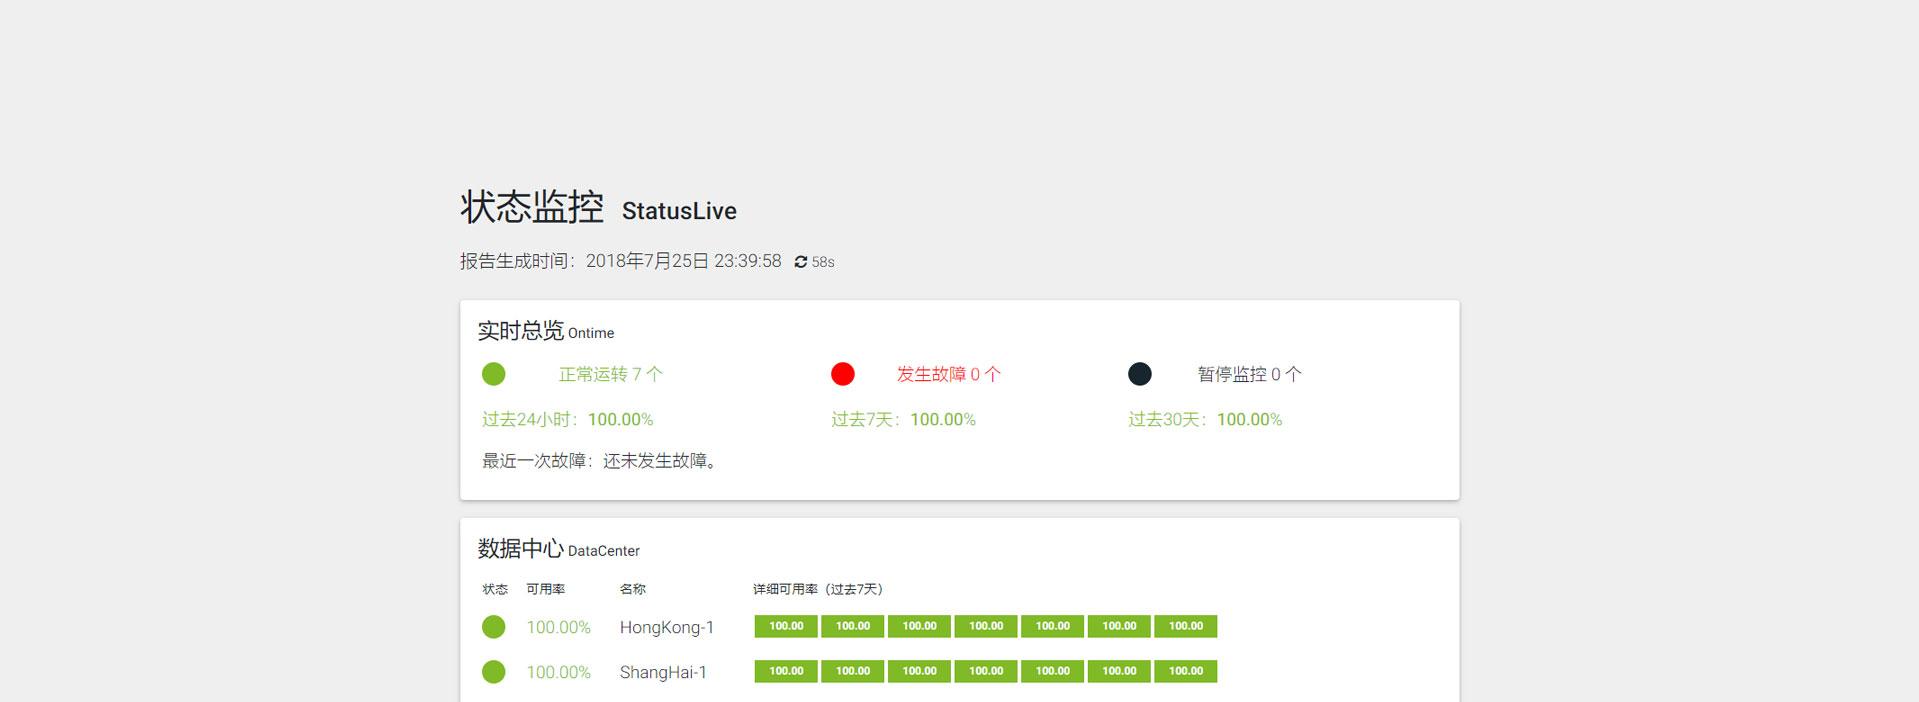 StatusLive V1.1 更新